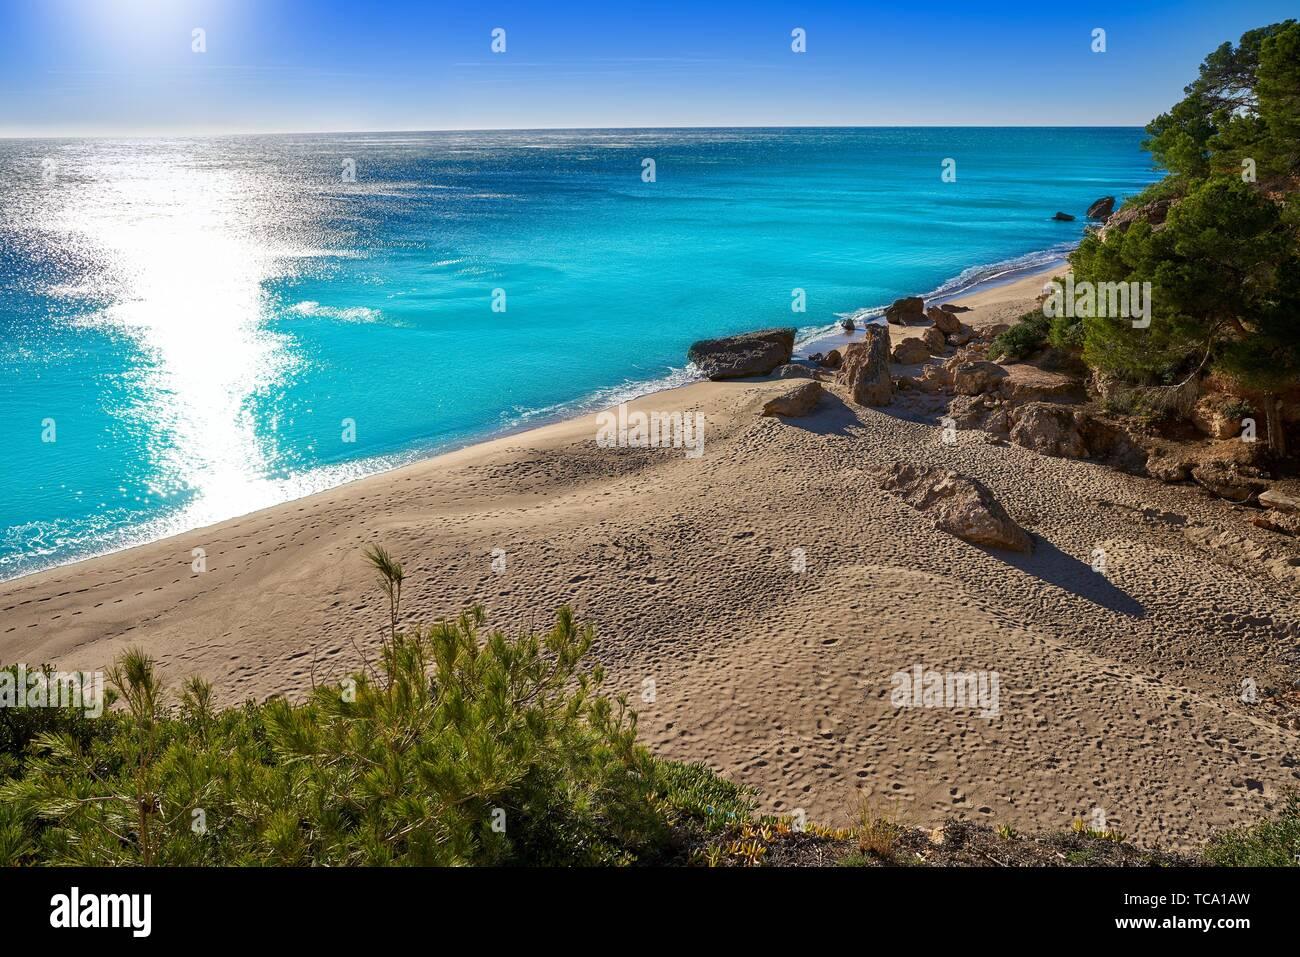 Cala Bot beach playa in Miami Platja of Tarragona at costa Dorada of Catalonia. - Stock Image